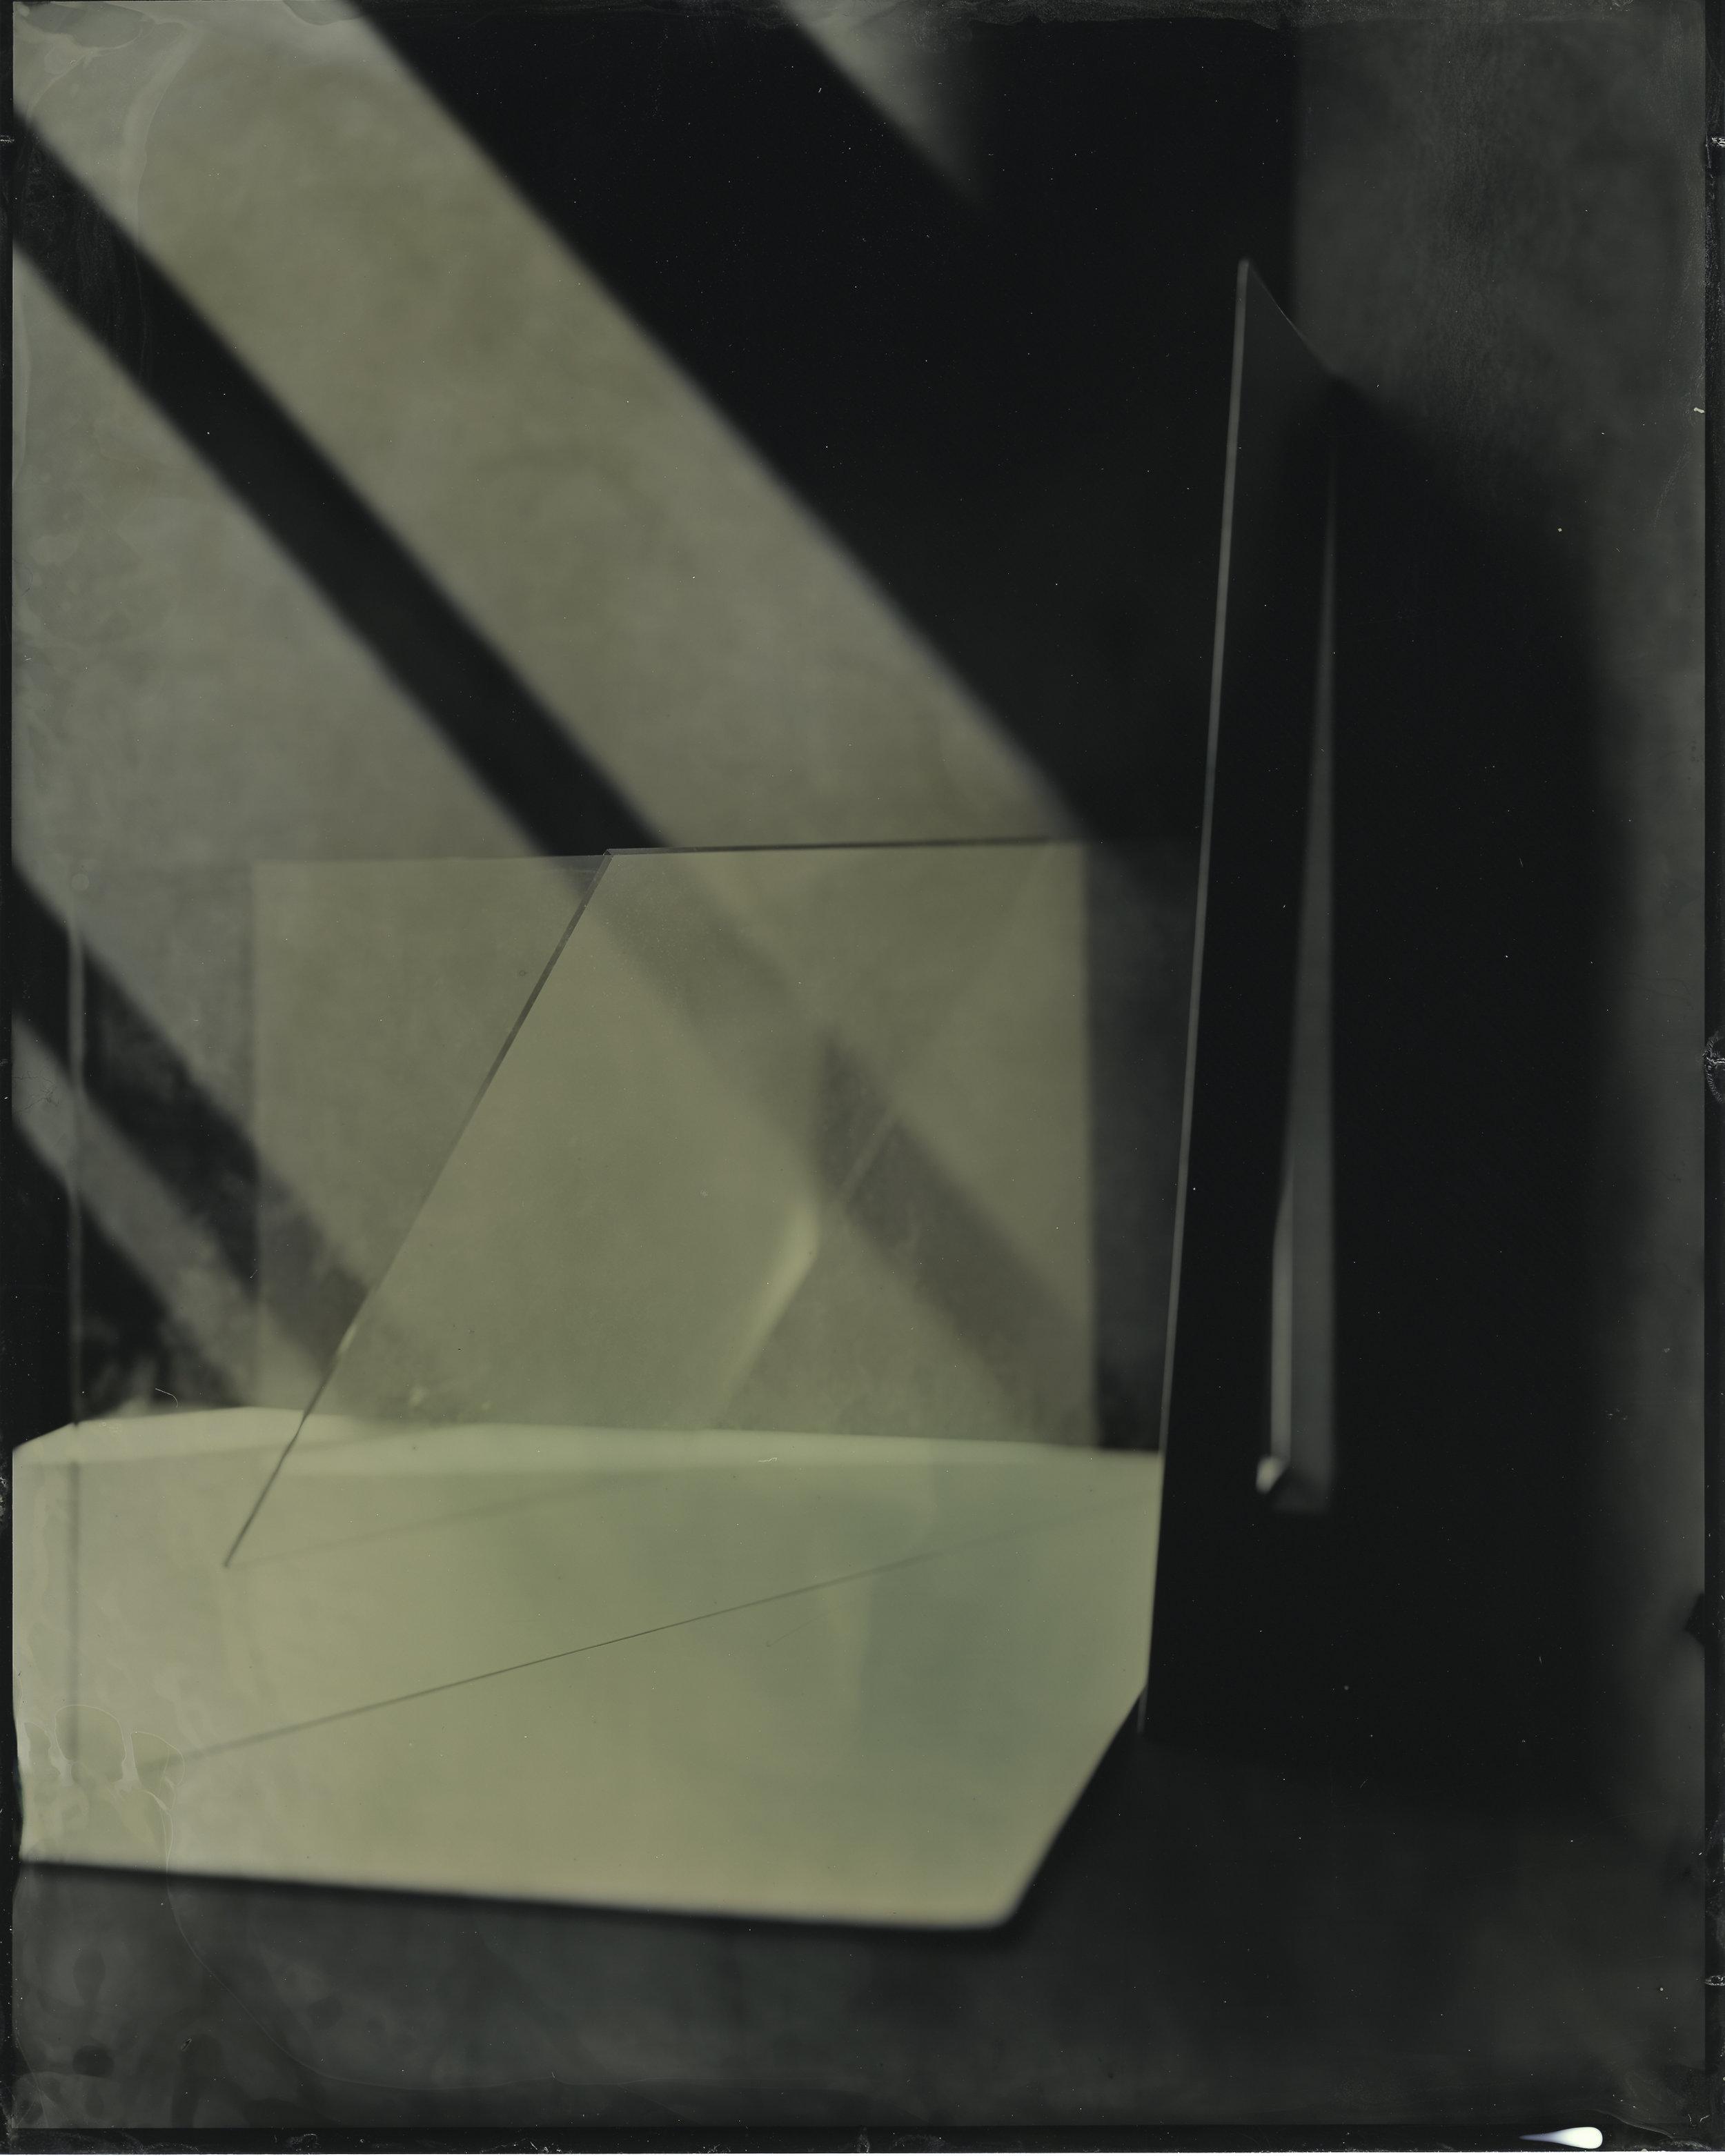 CollodionPlate.April'19.006.jpg